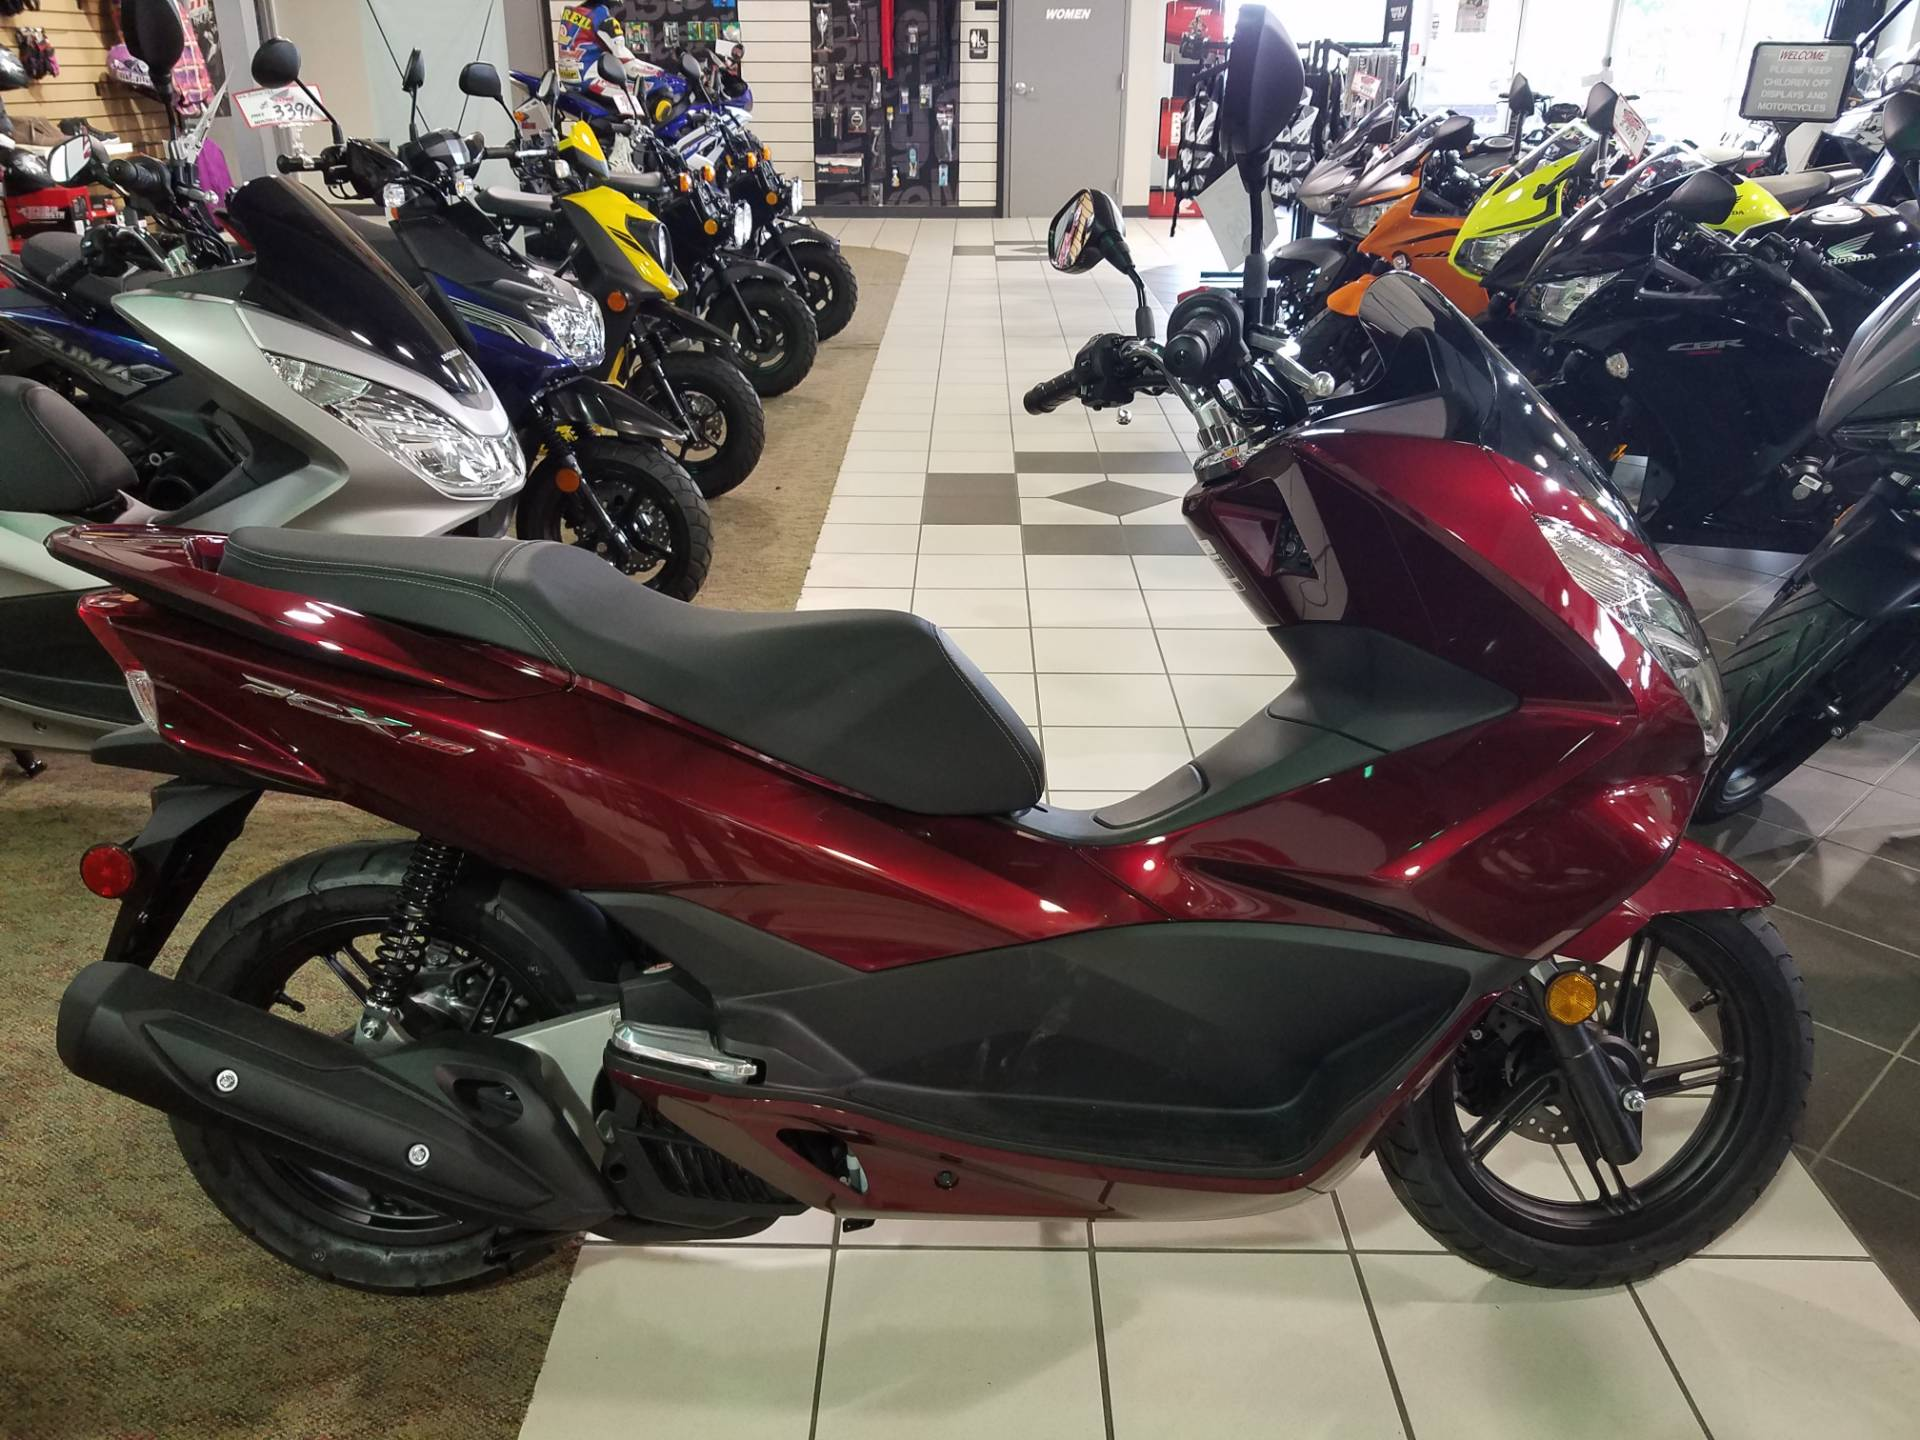 2016 Honda PCX150 Dark Candy Red in Rockwall, Texas